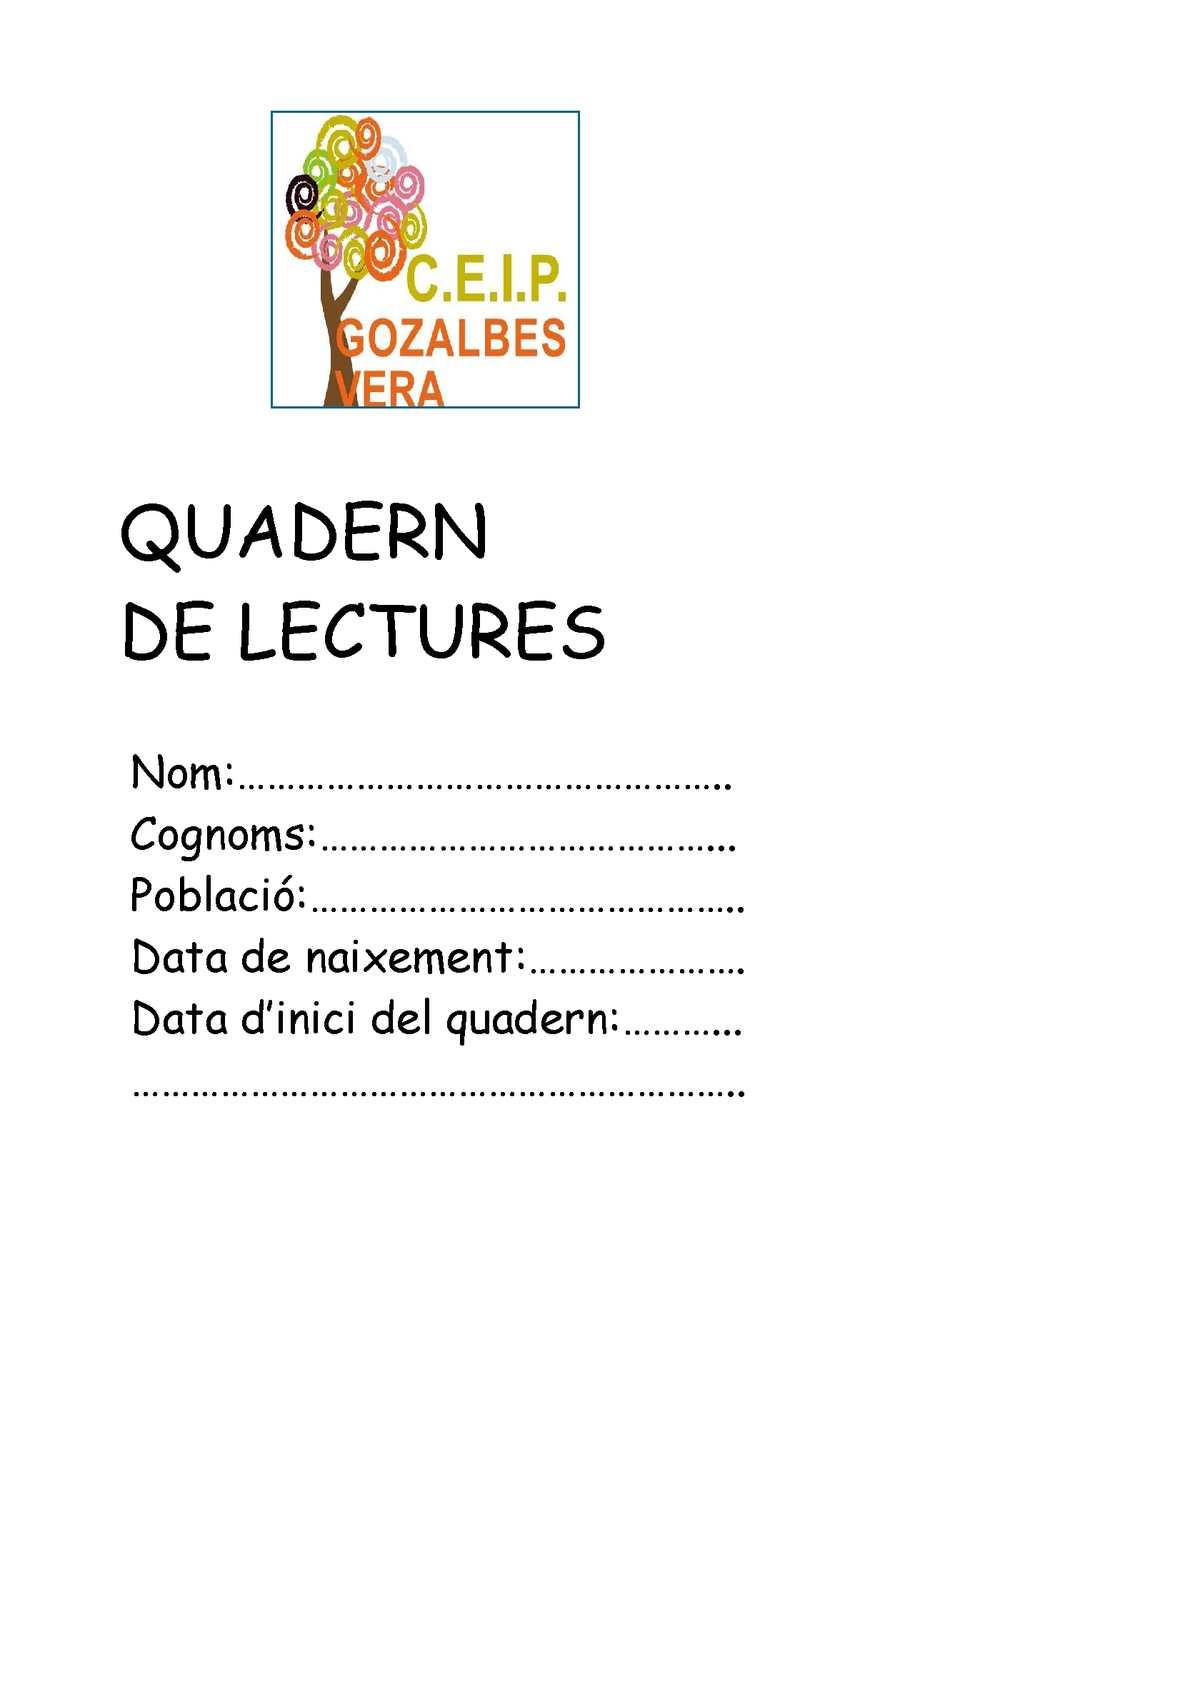 Quadern de lectures